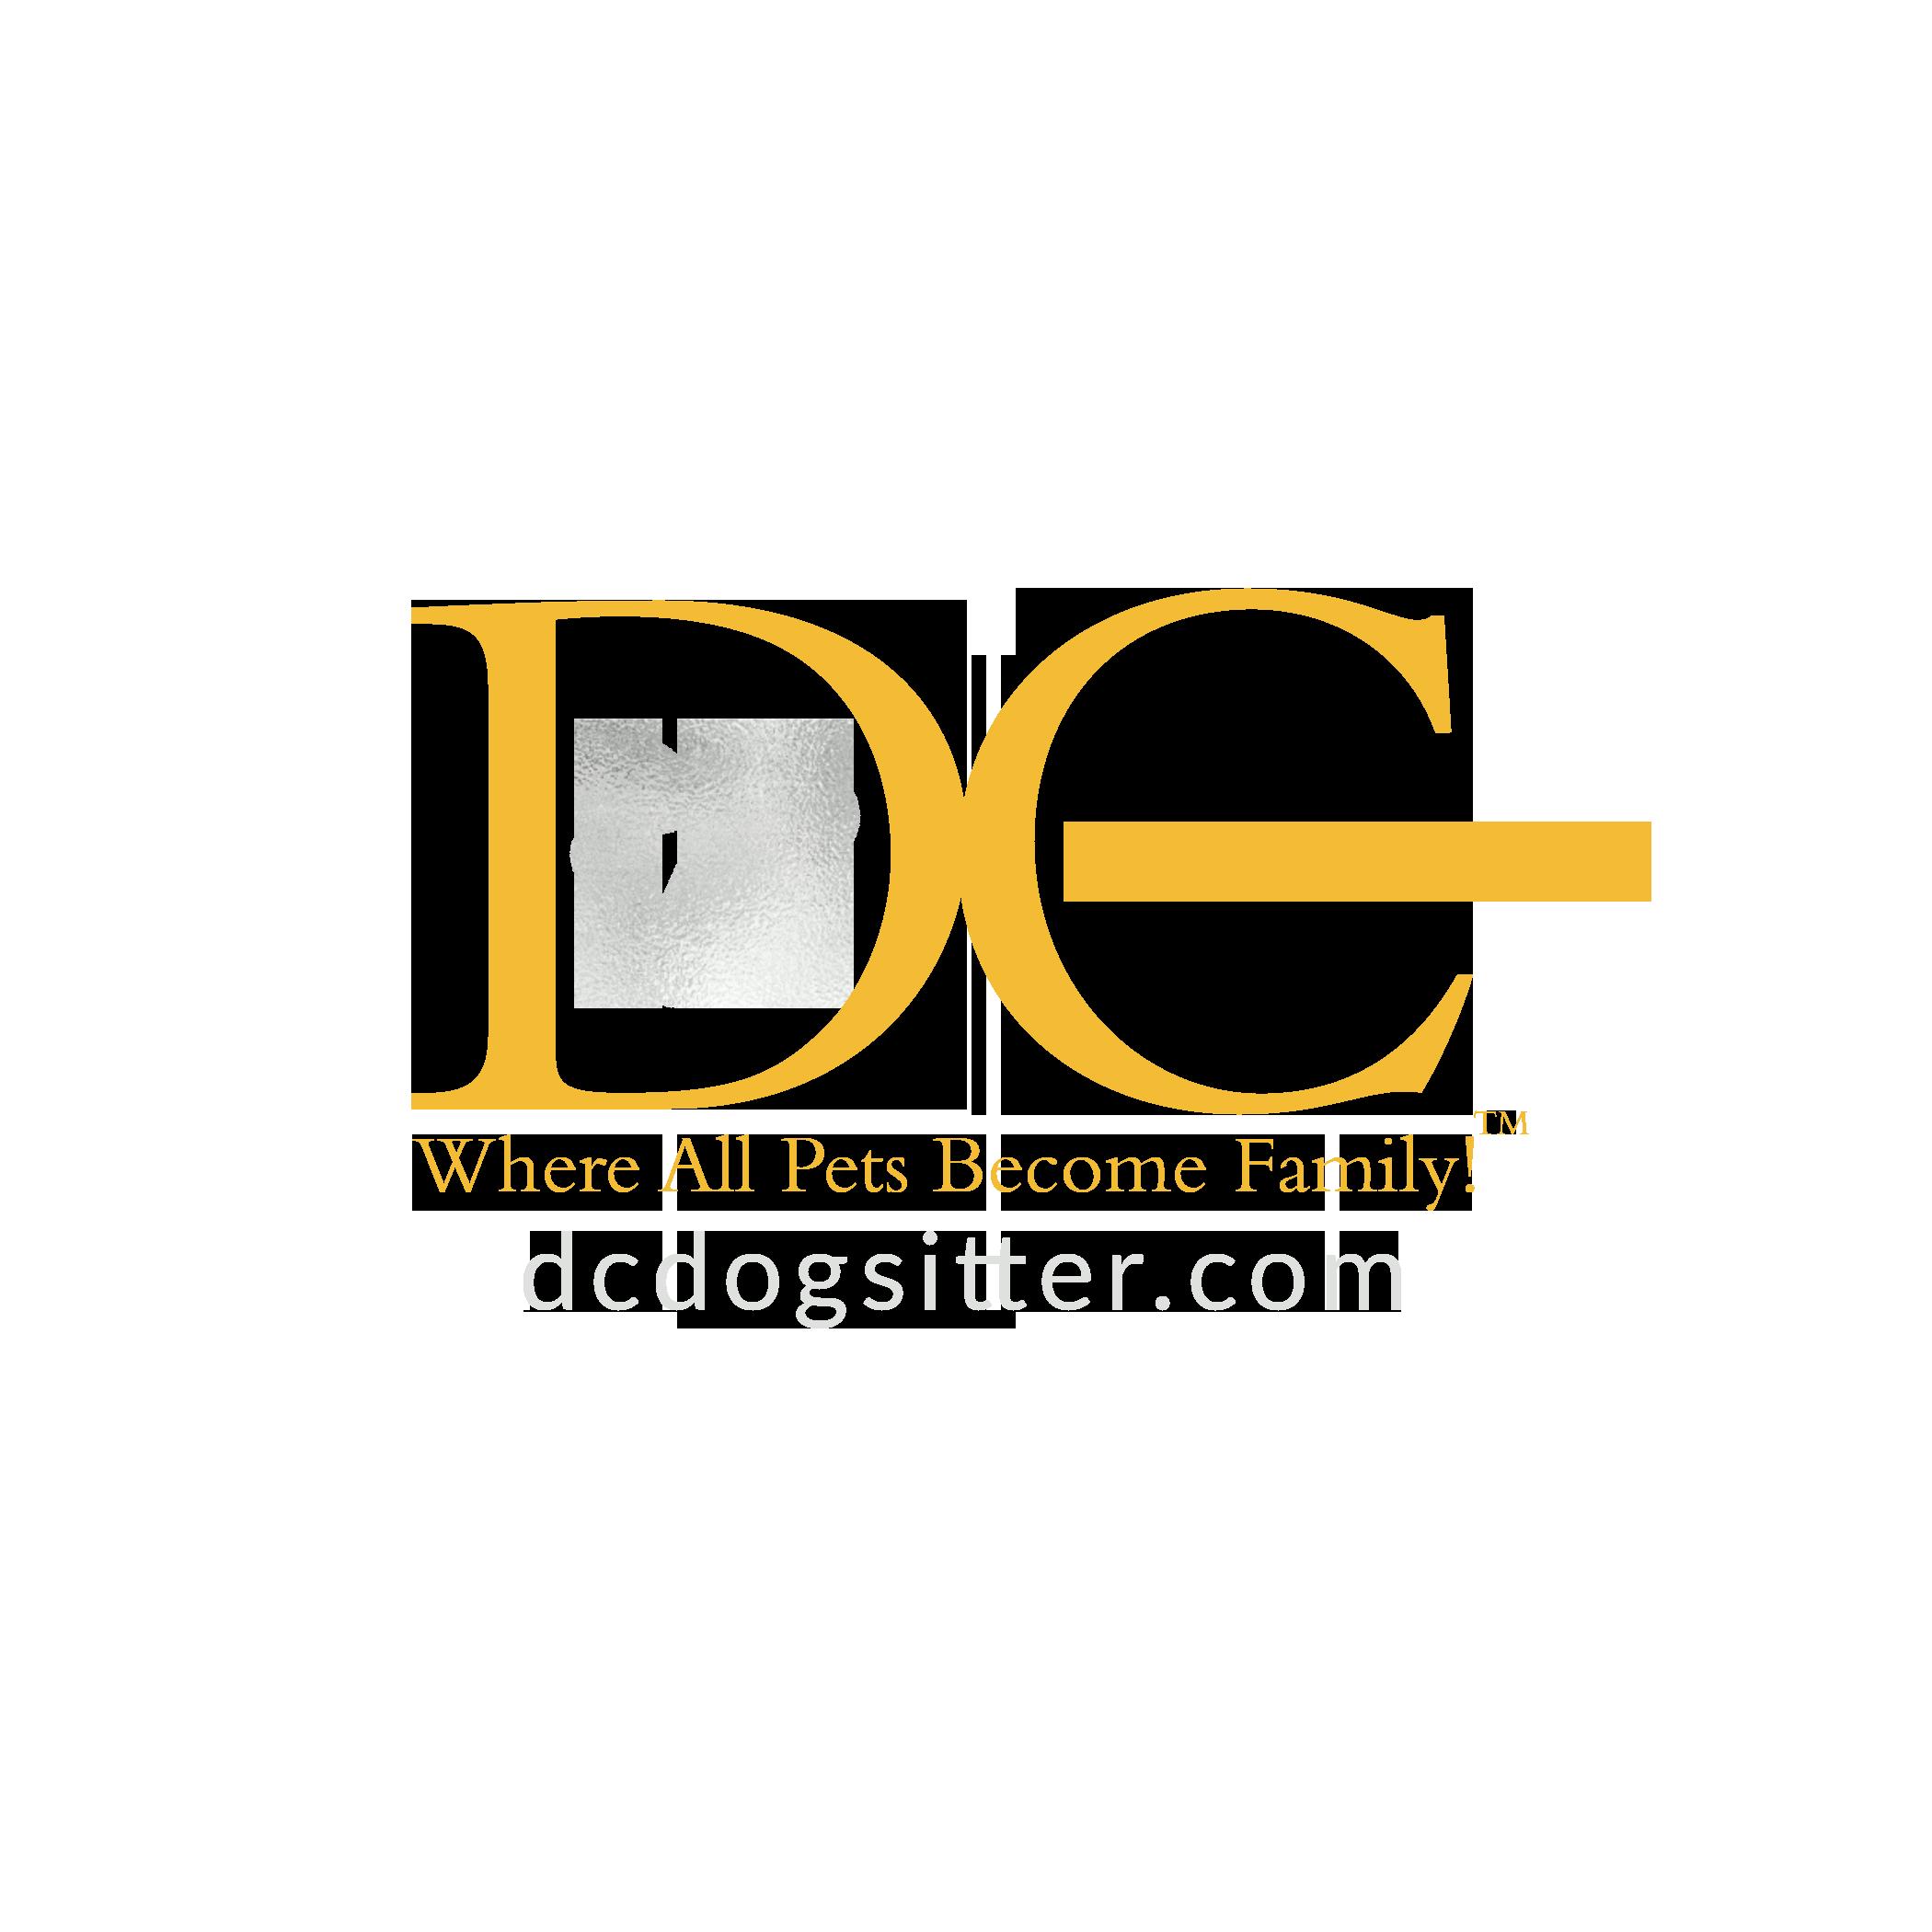 DC Dogsitter